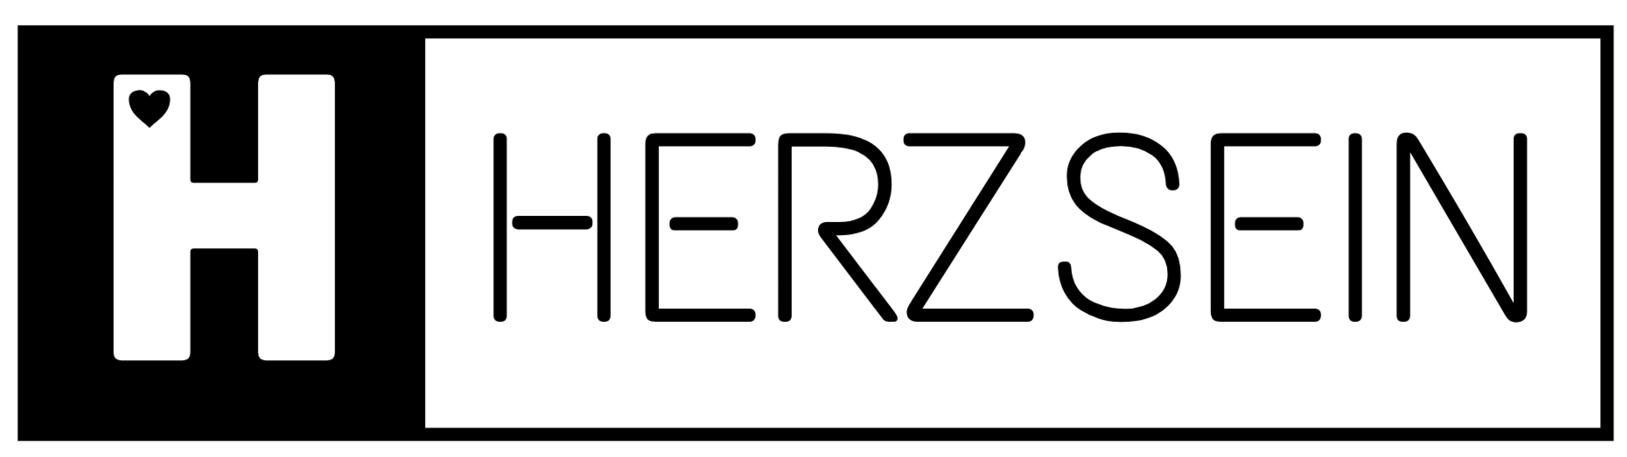 HERZSEIN